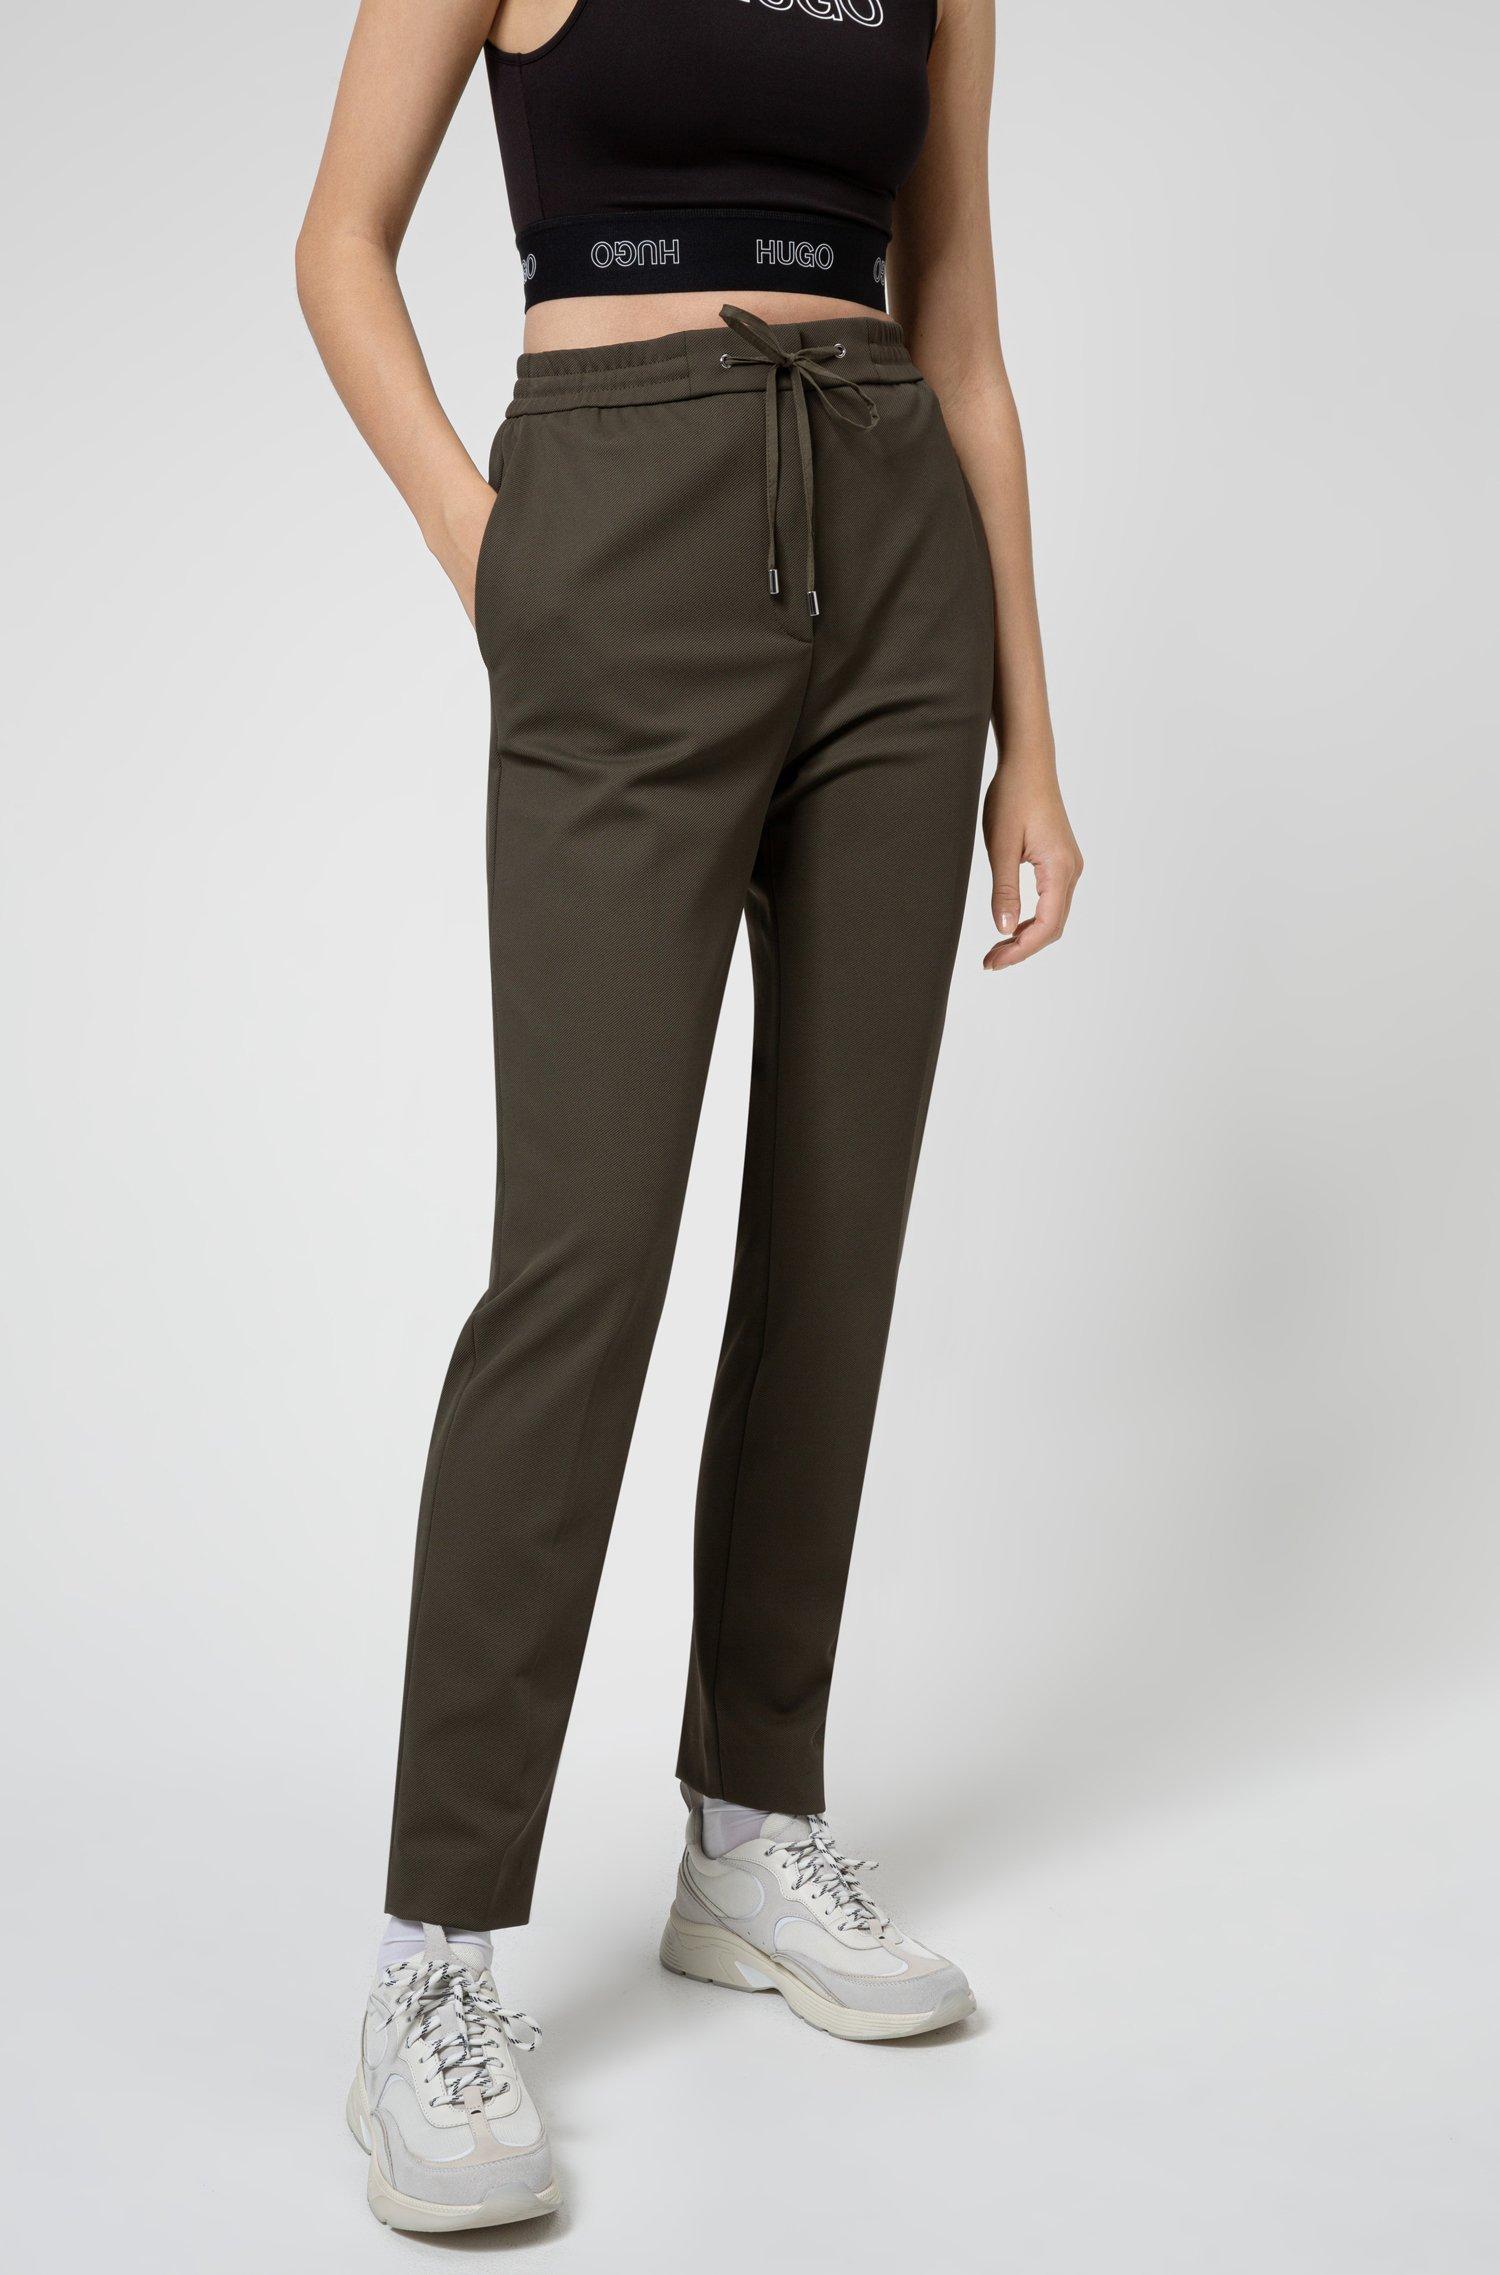 Stretch-fabric trousers with logo-tape drawstring waistband, Khaki